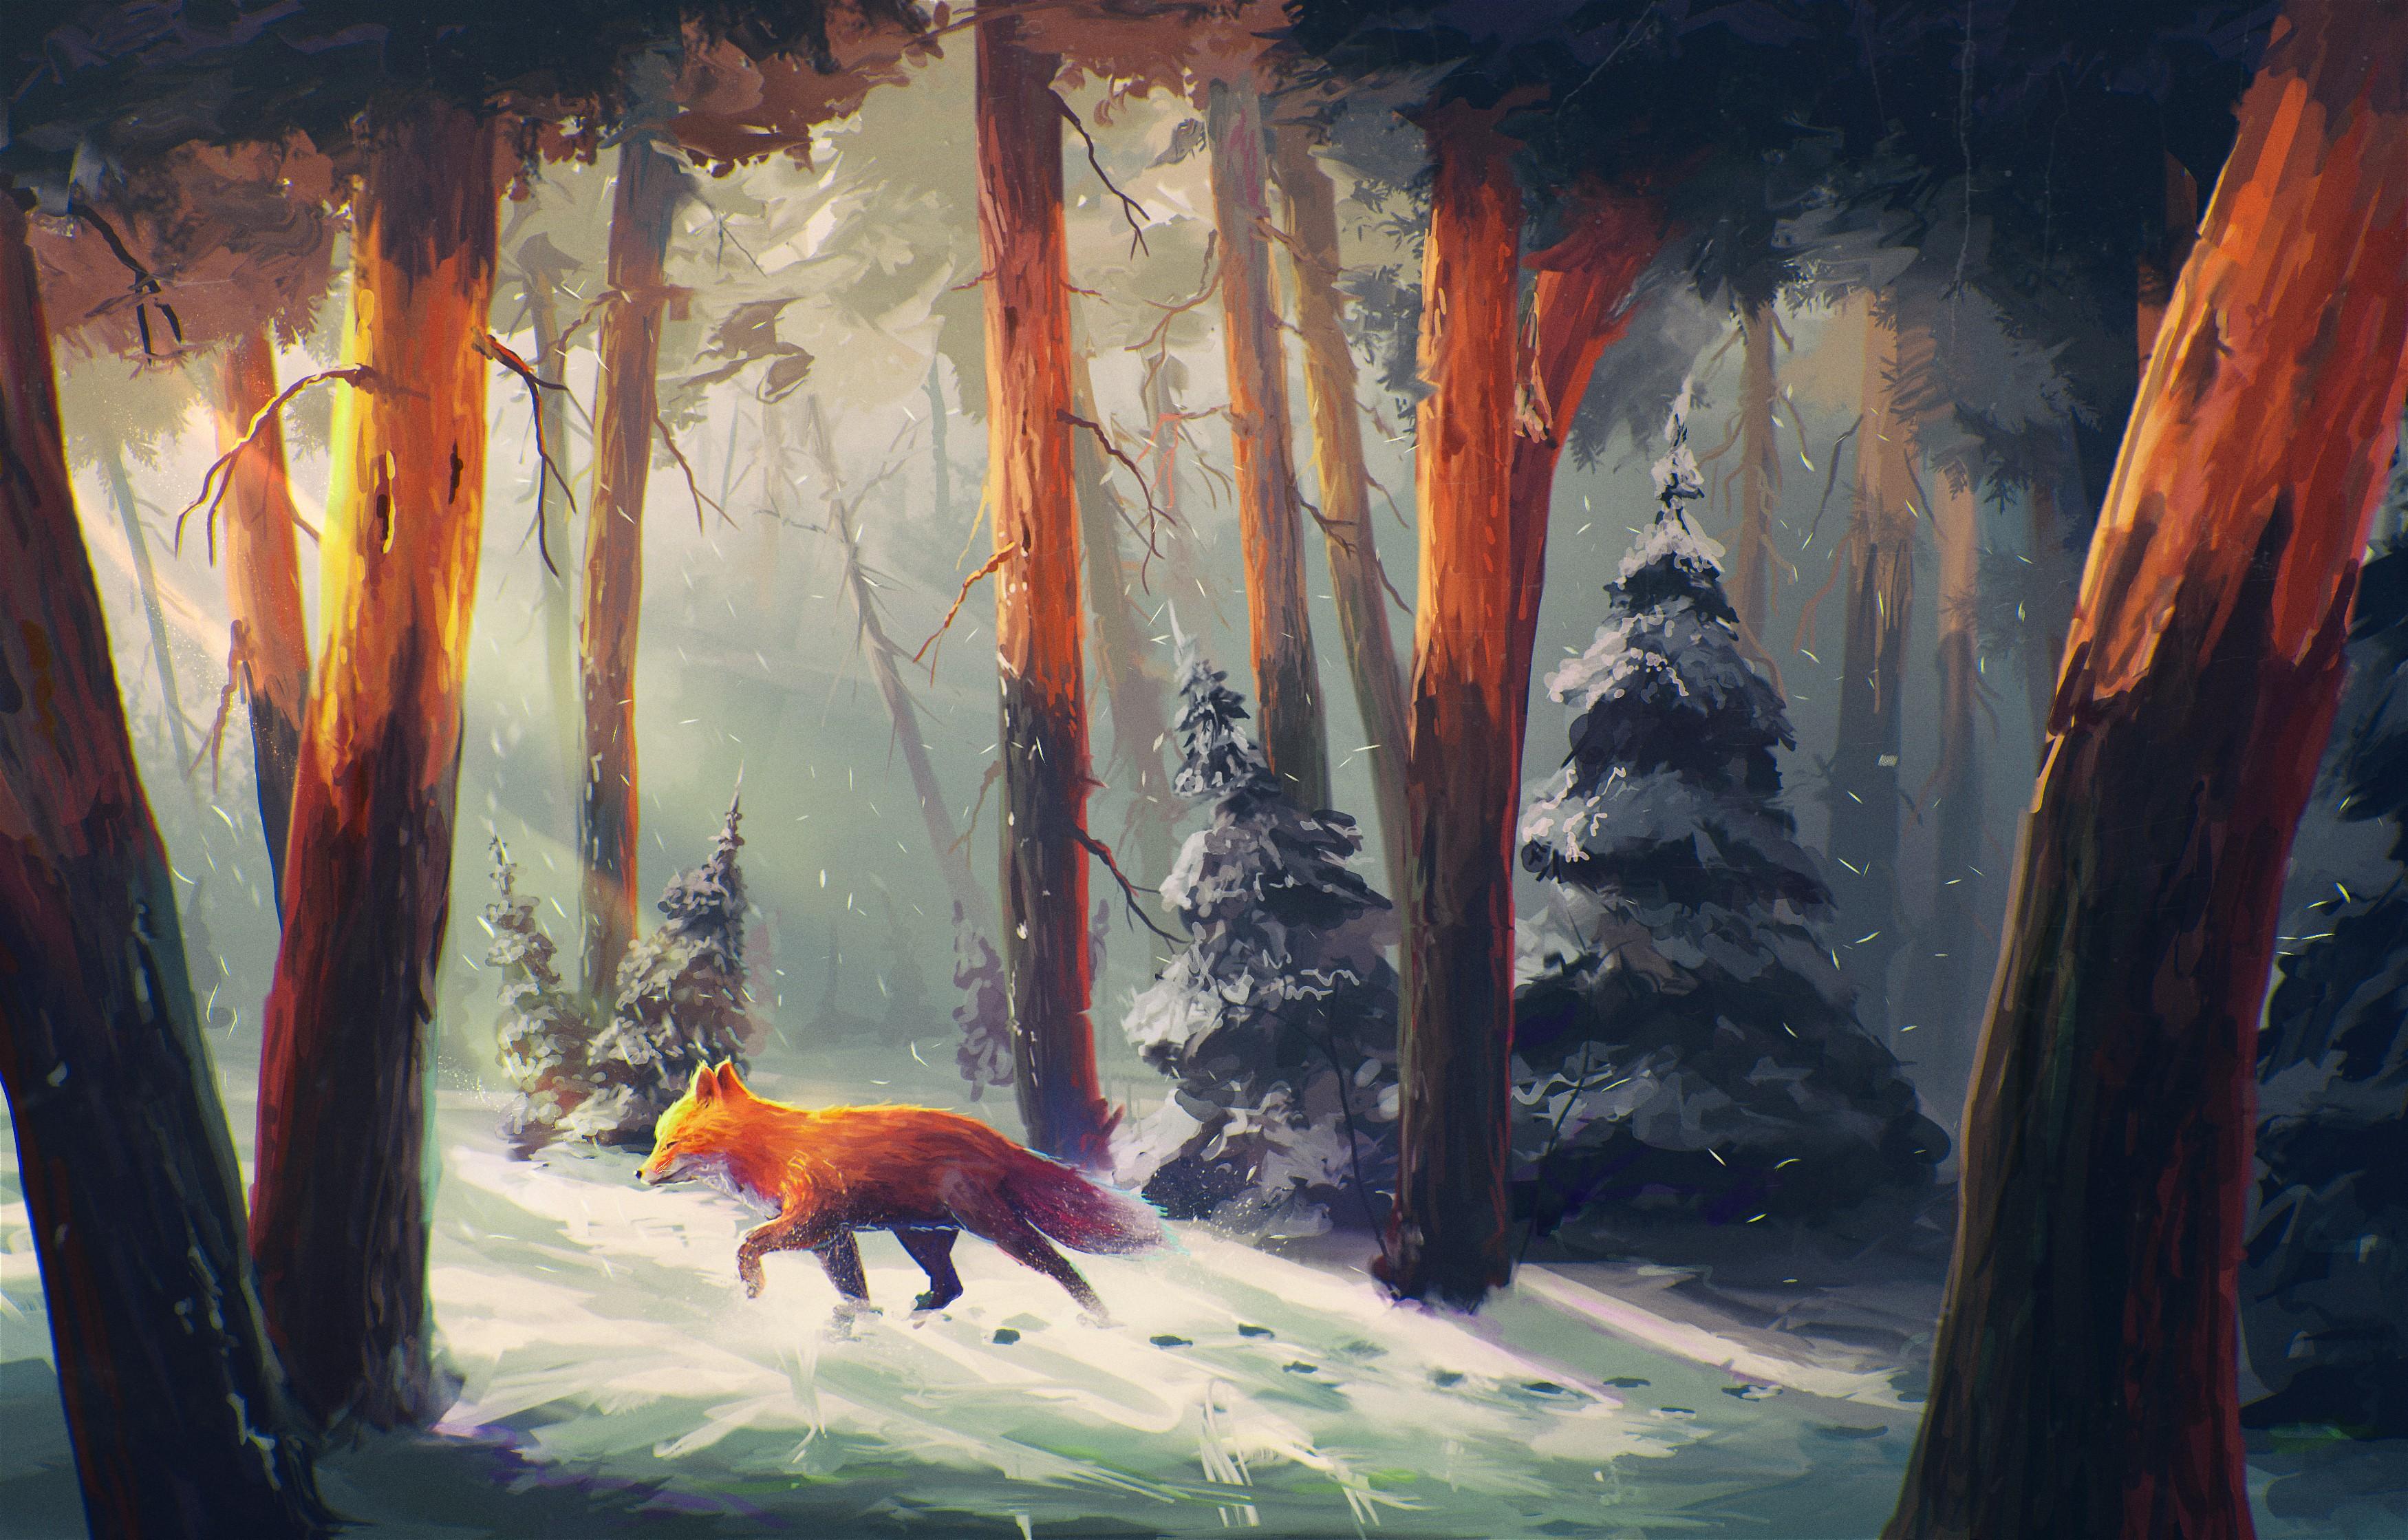 General 3500x2238 nature animals snow artwork digital art forest Sylar sunlight fox orange snowing